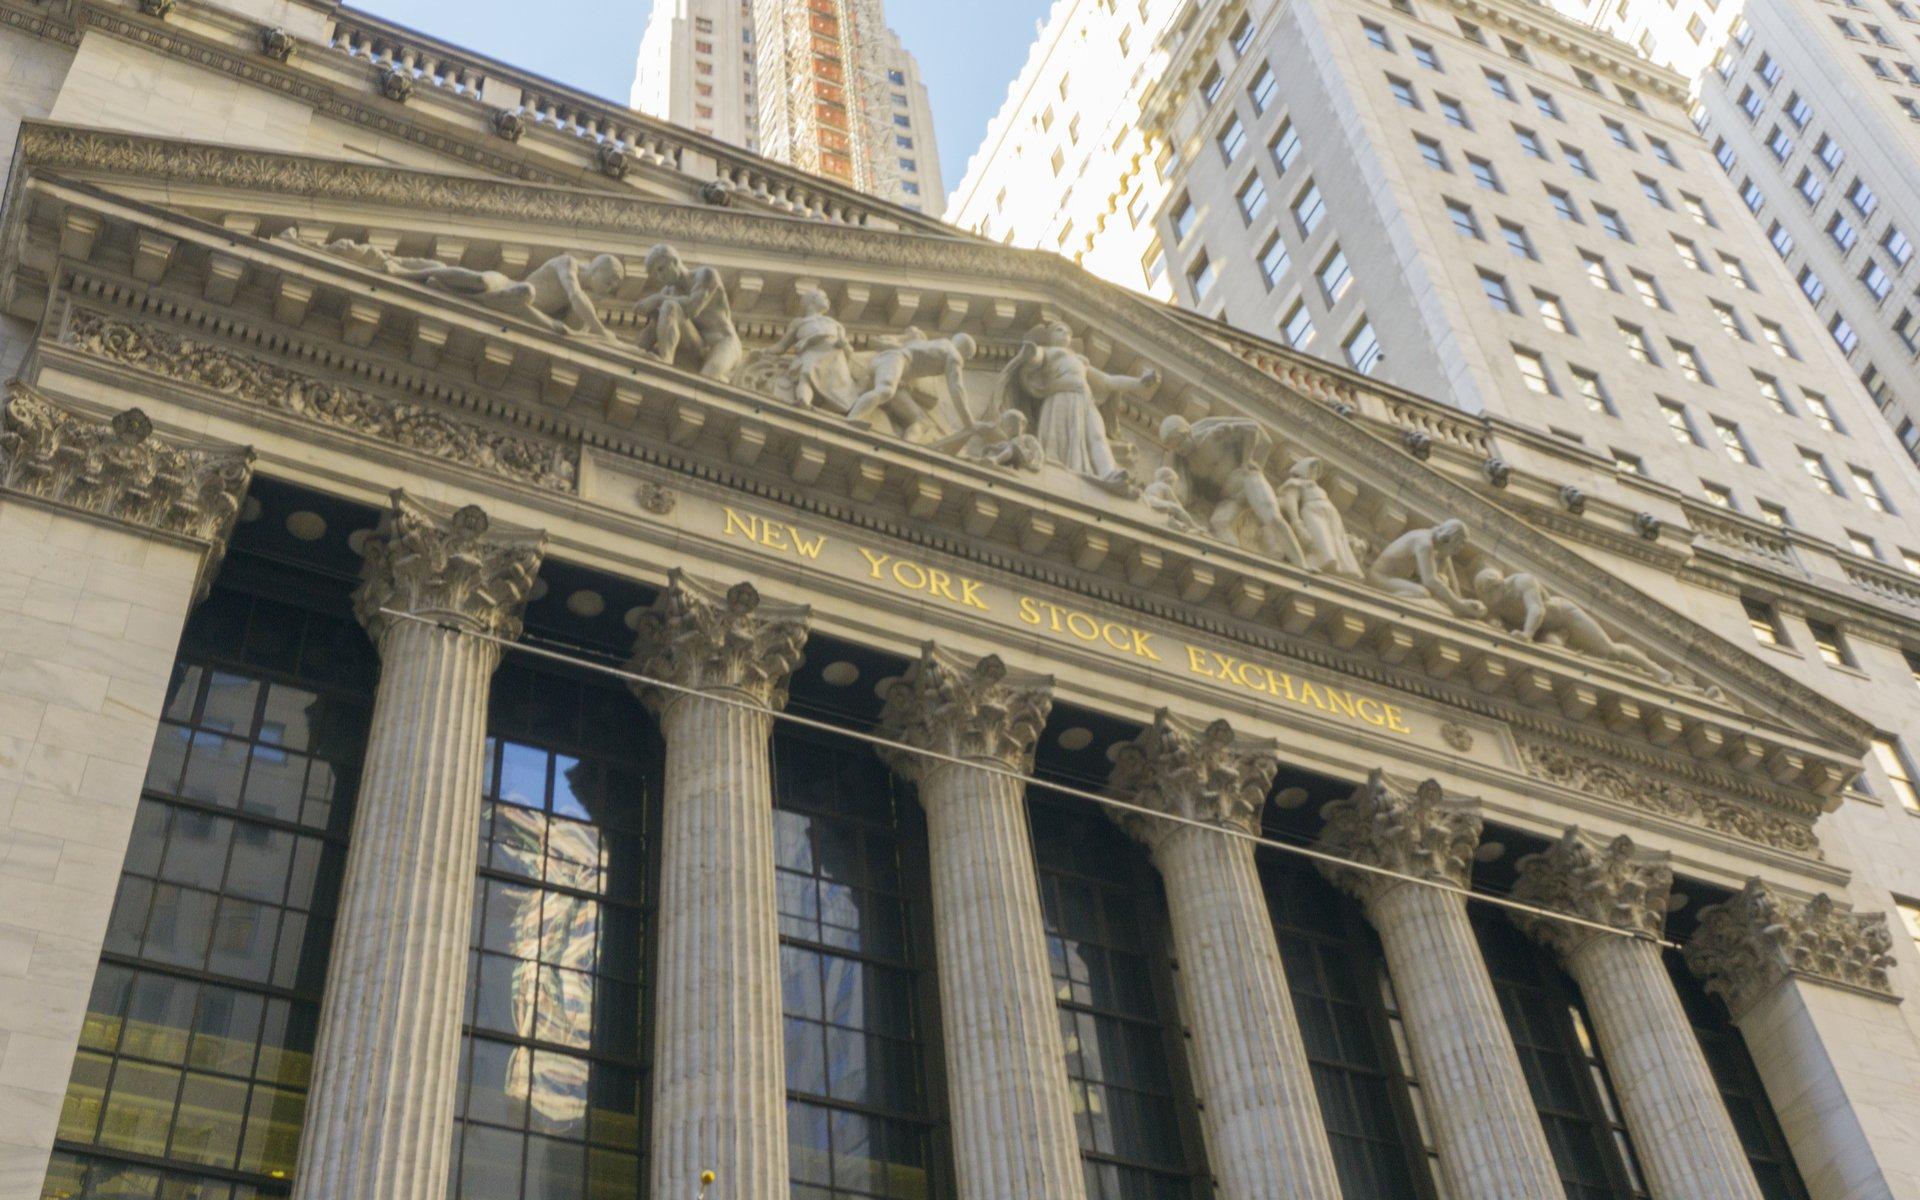 NYSE starbucks